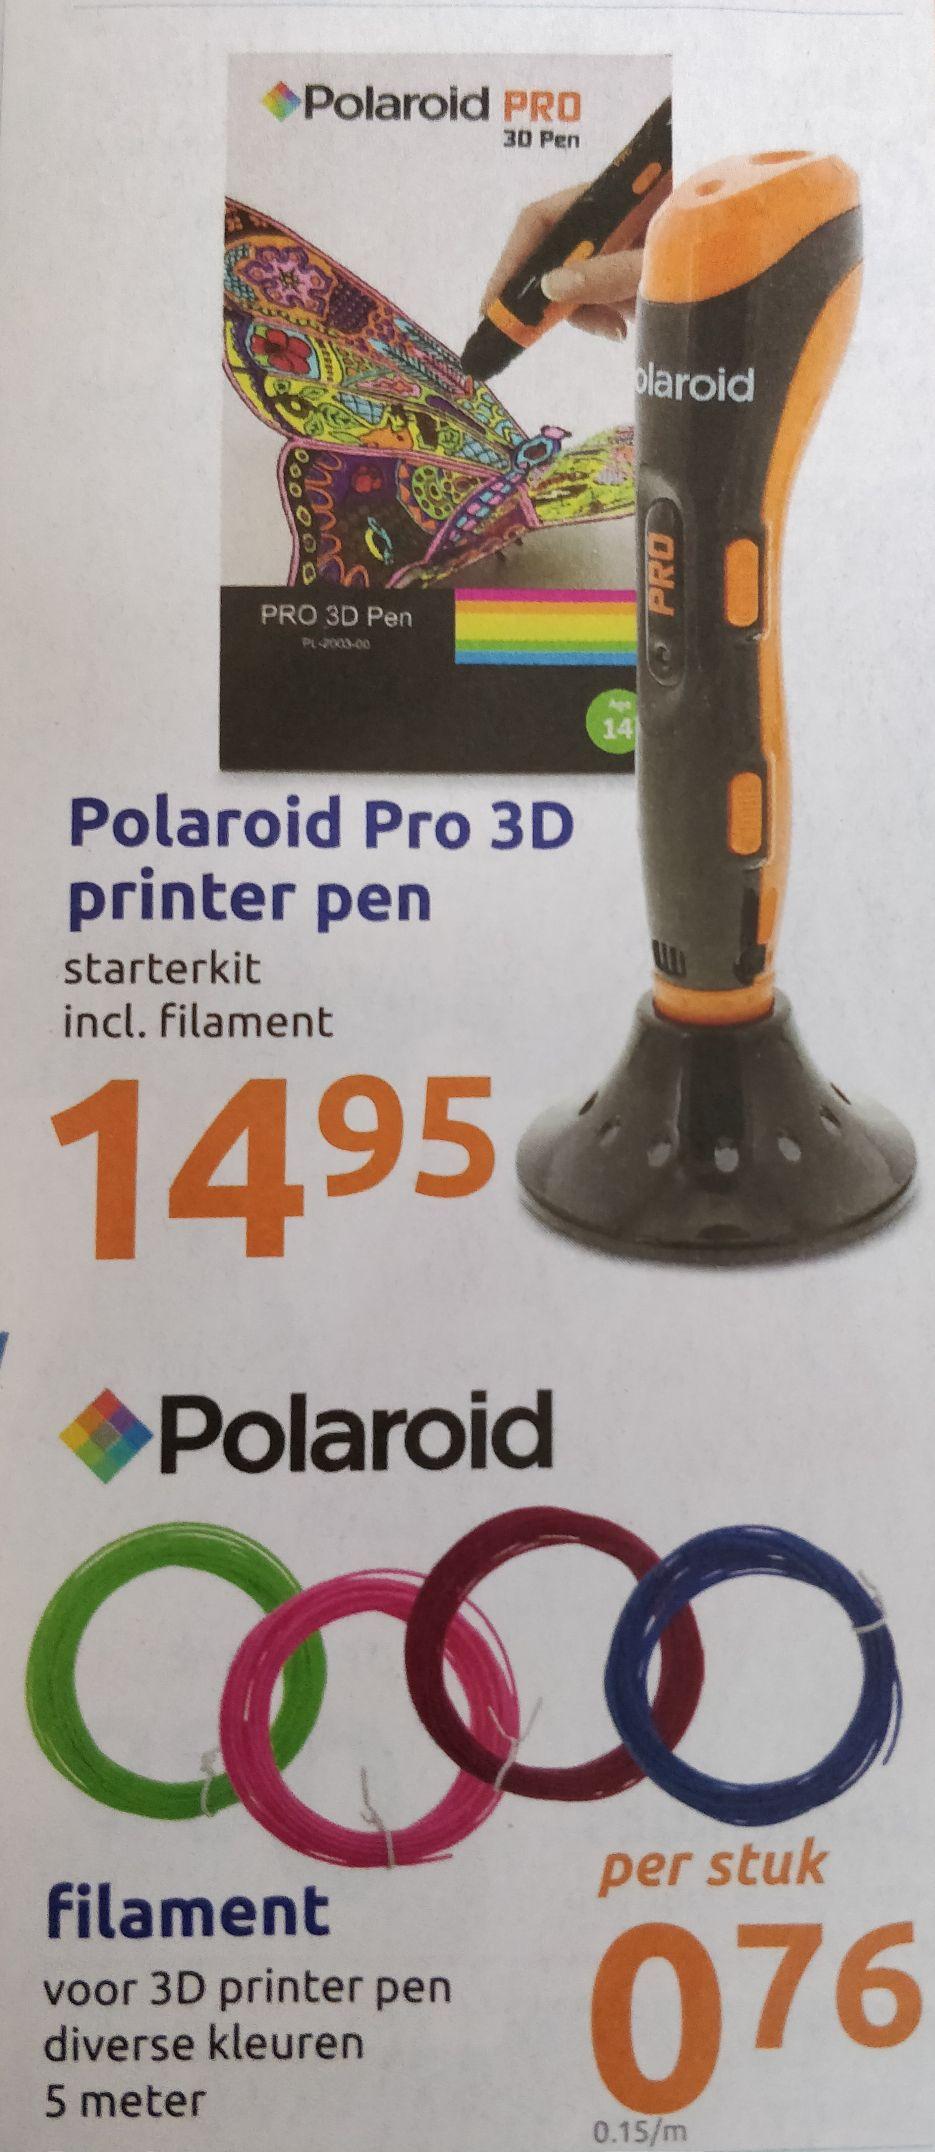 Polaroid 3D printer pen